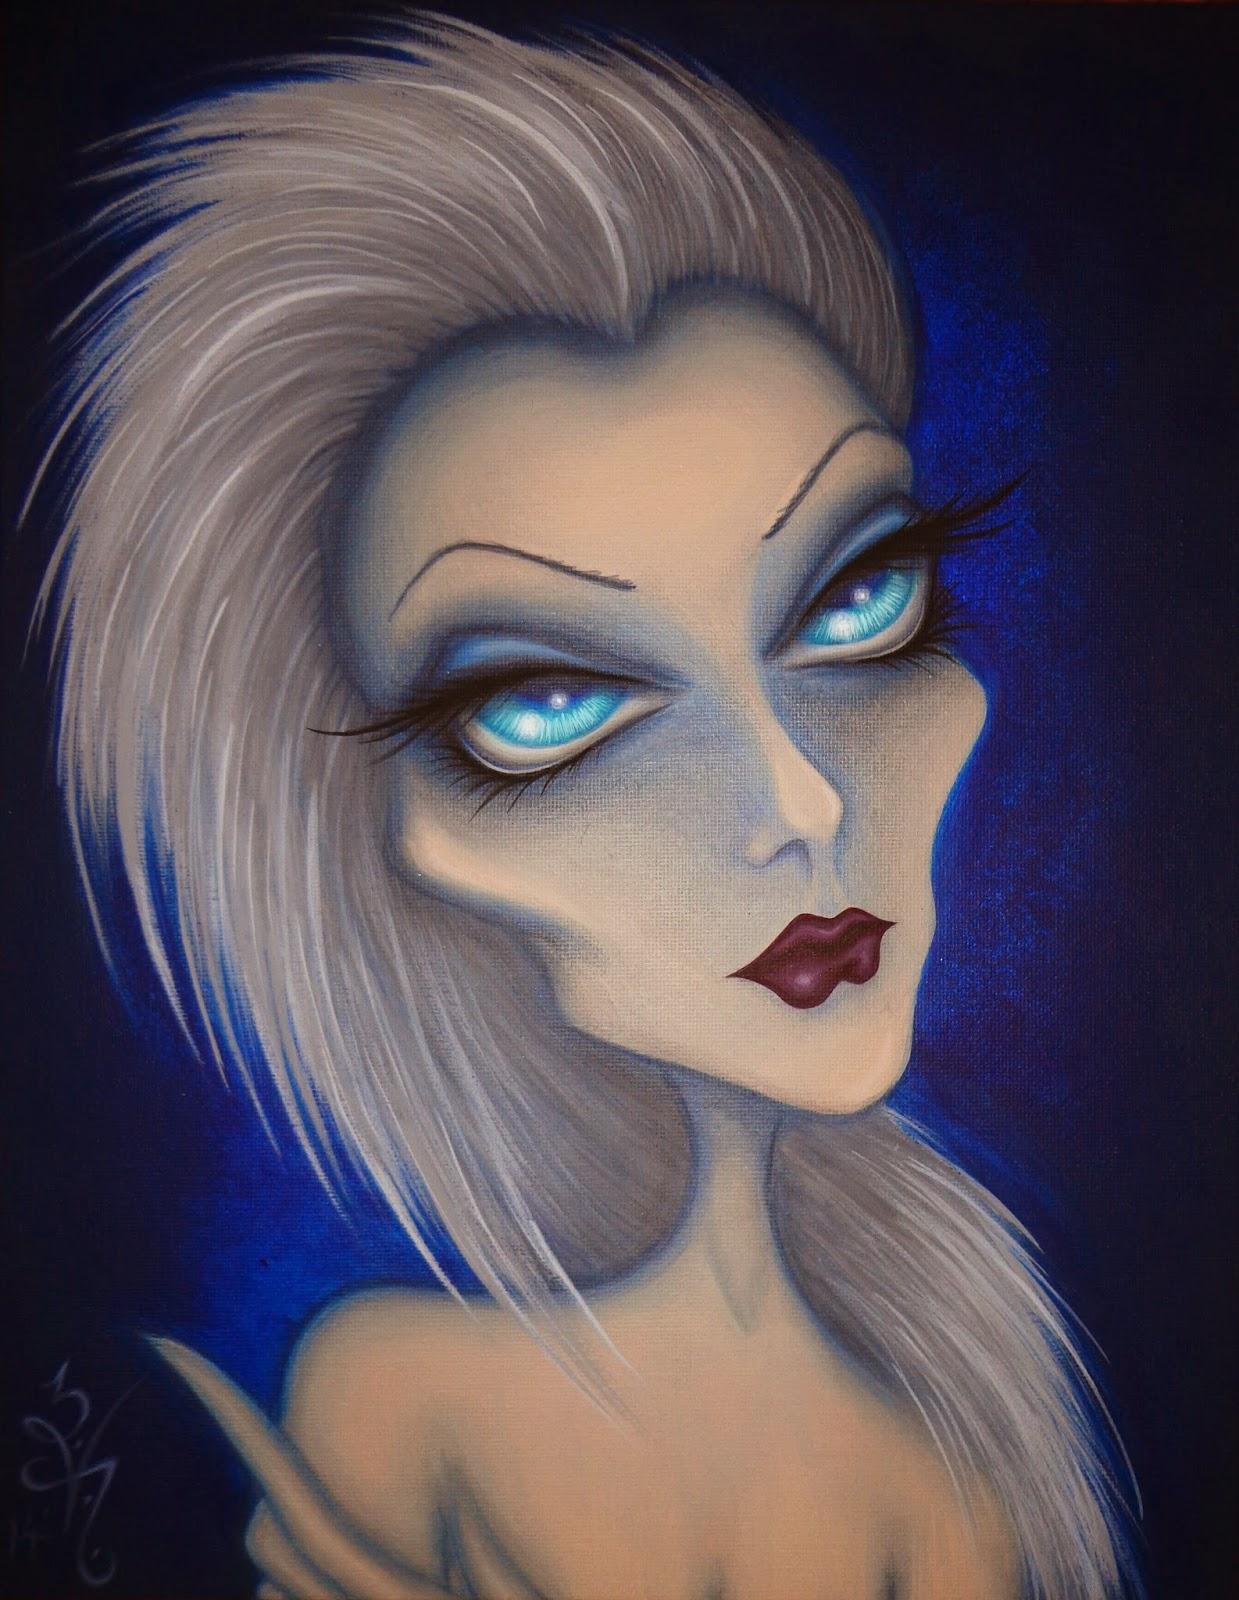 https://www.etsy.com/listing/207996198/original-fantasy-lowbrow-woman-girl-face?ref=shop_home_active_13